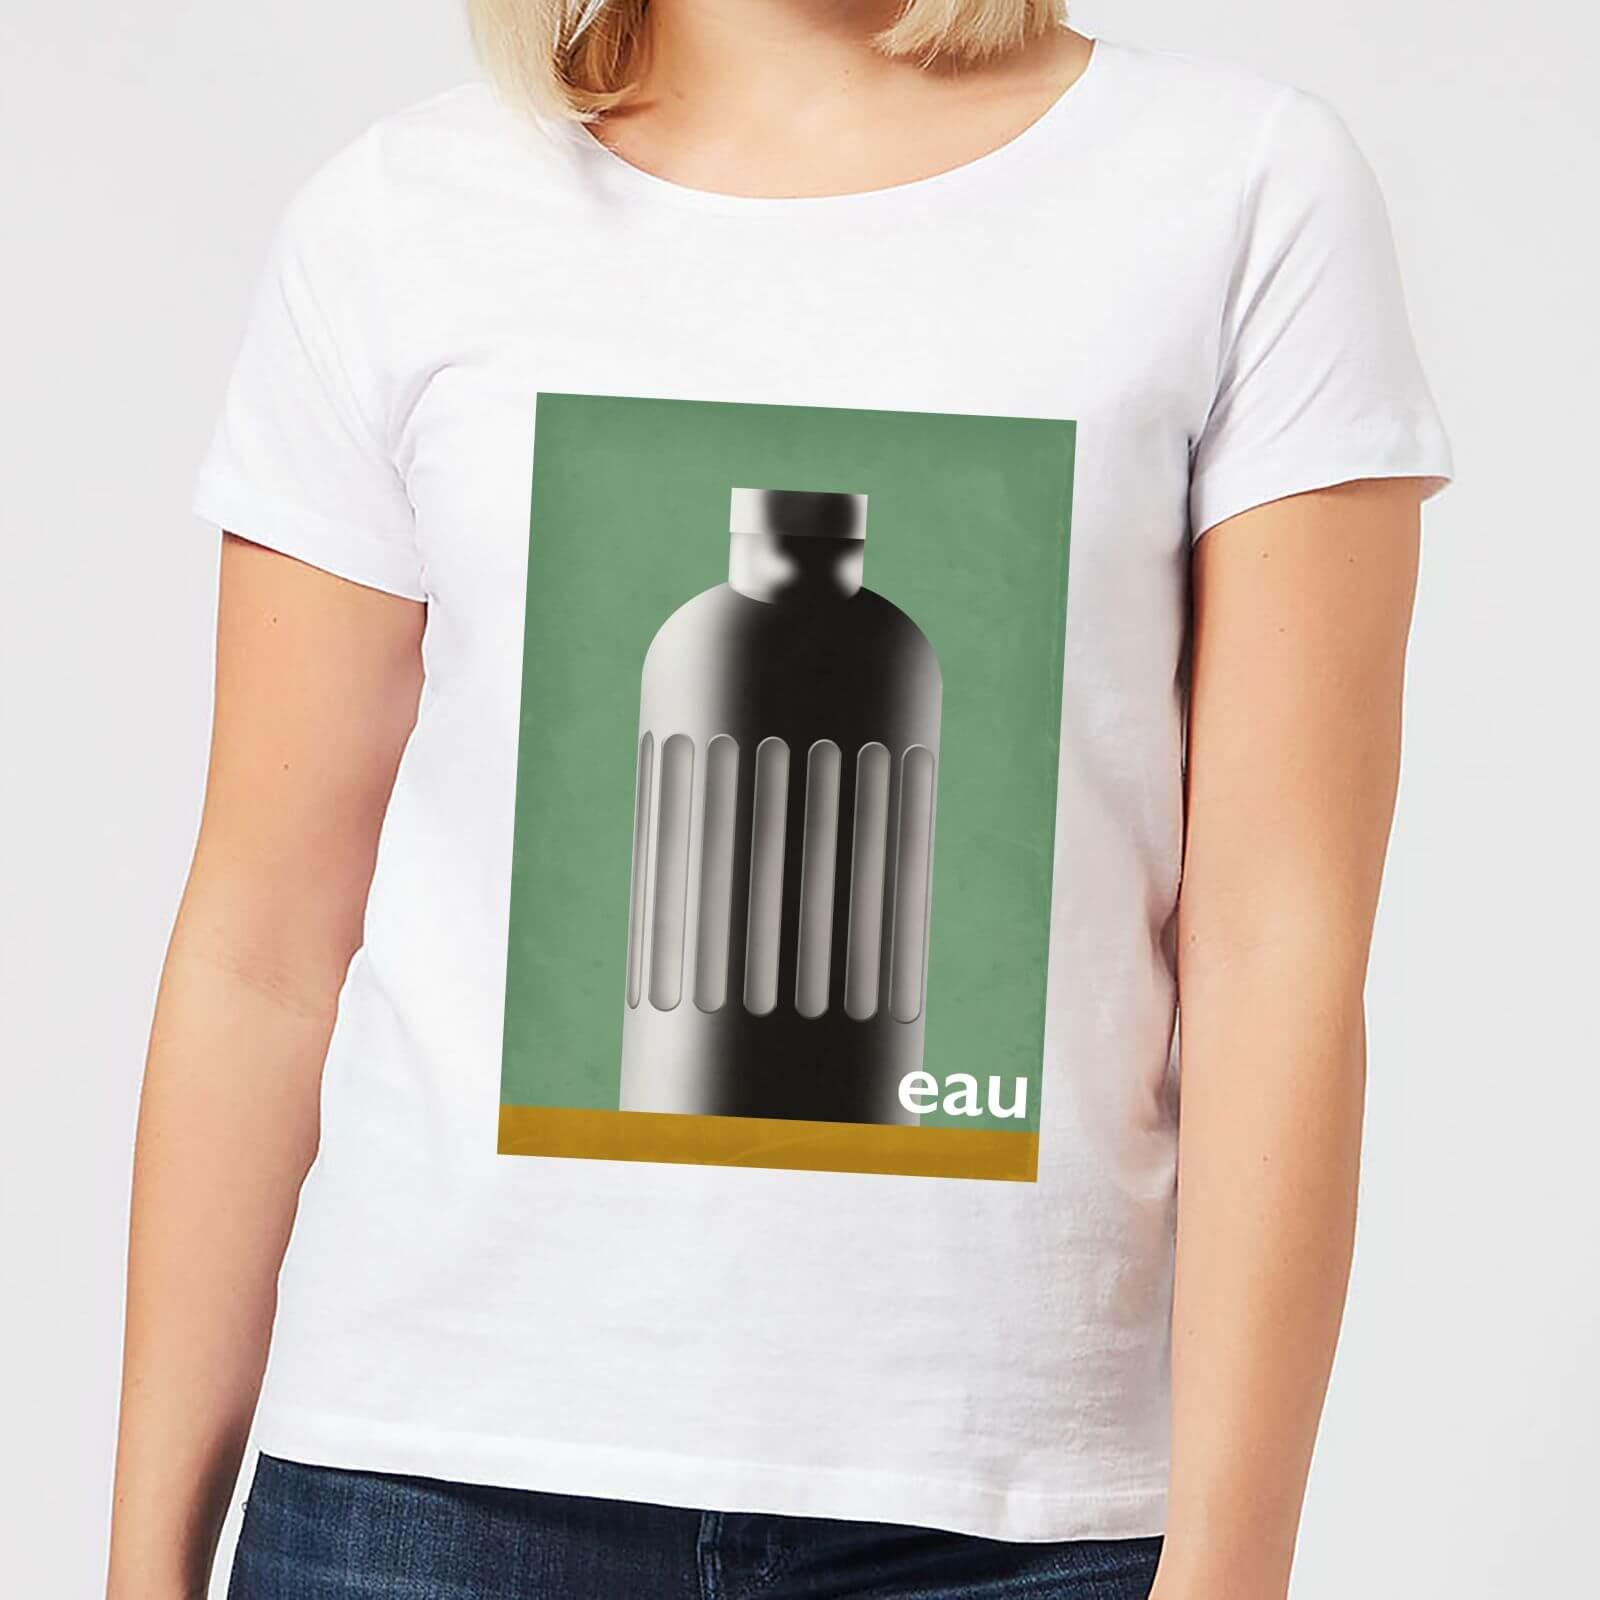 Mark Fairhurst Eau Women's T-Shirt - White - XL - White